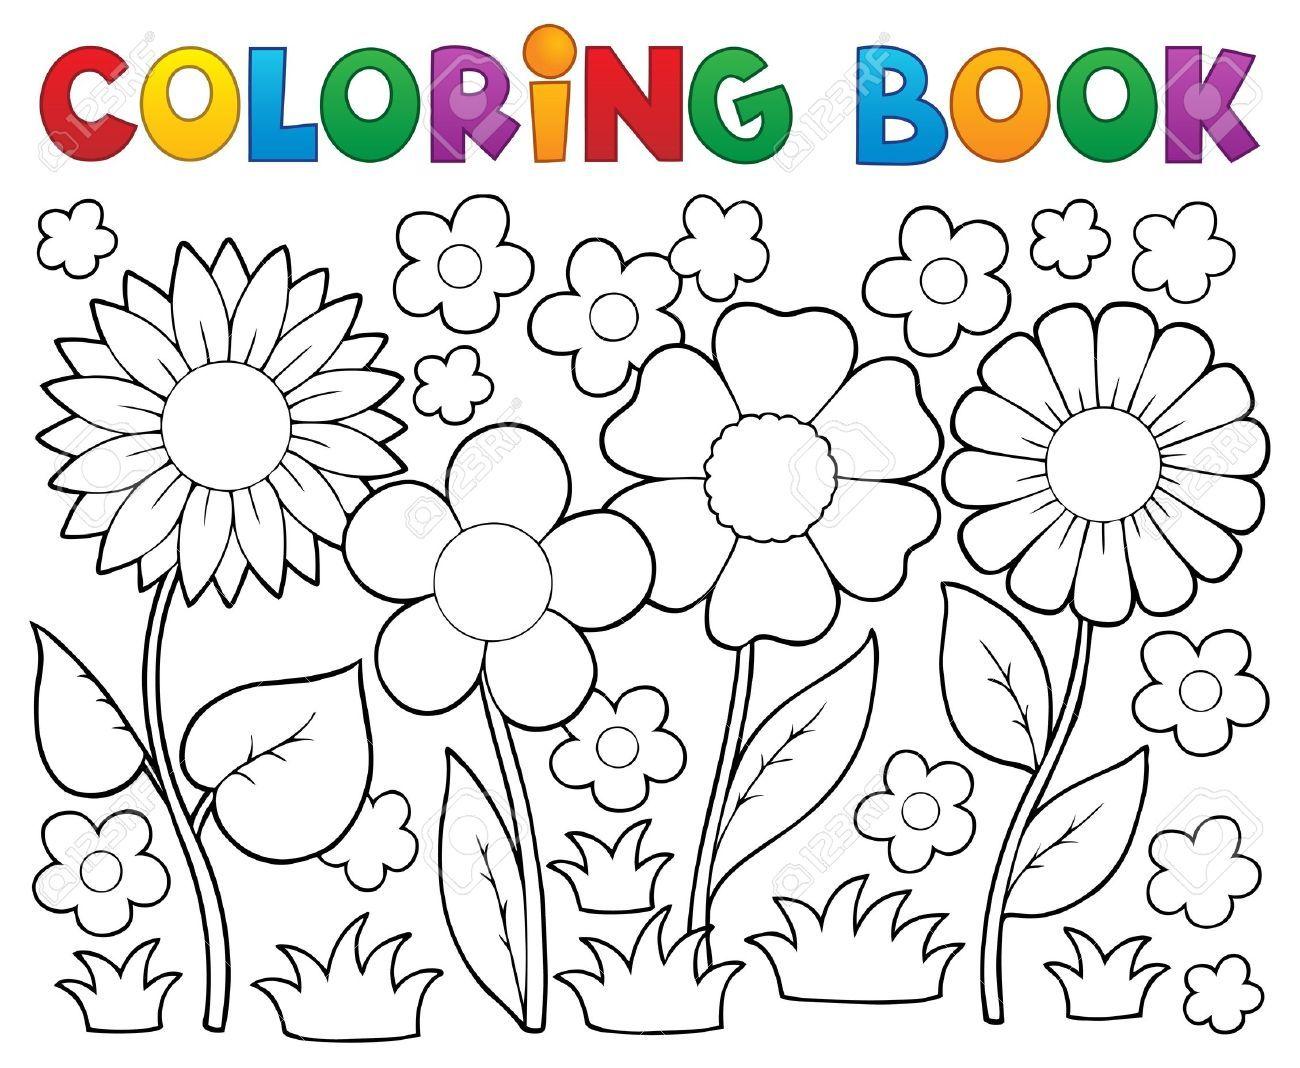 Bloom libro Coloring Book - Buscar con Google | Dibujo | Pinterest ...